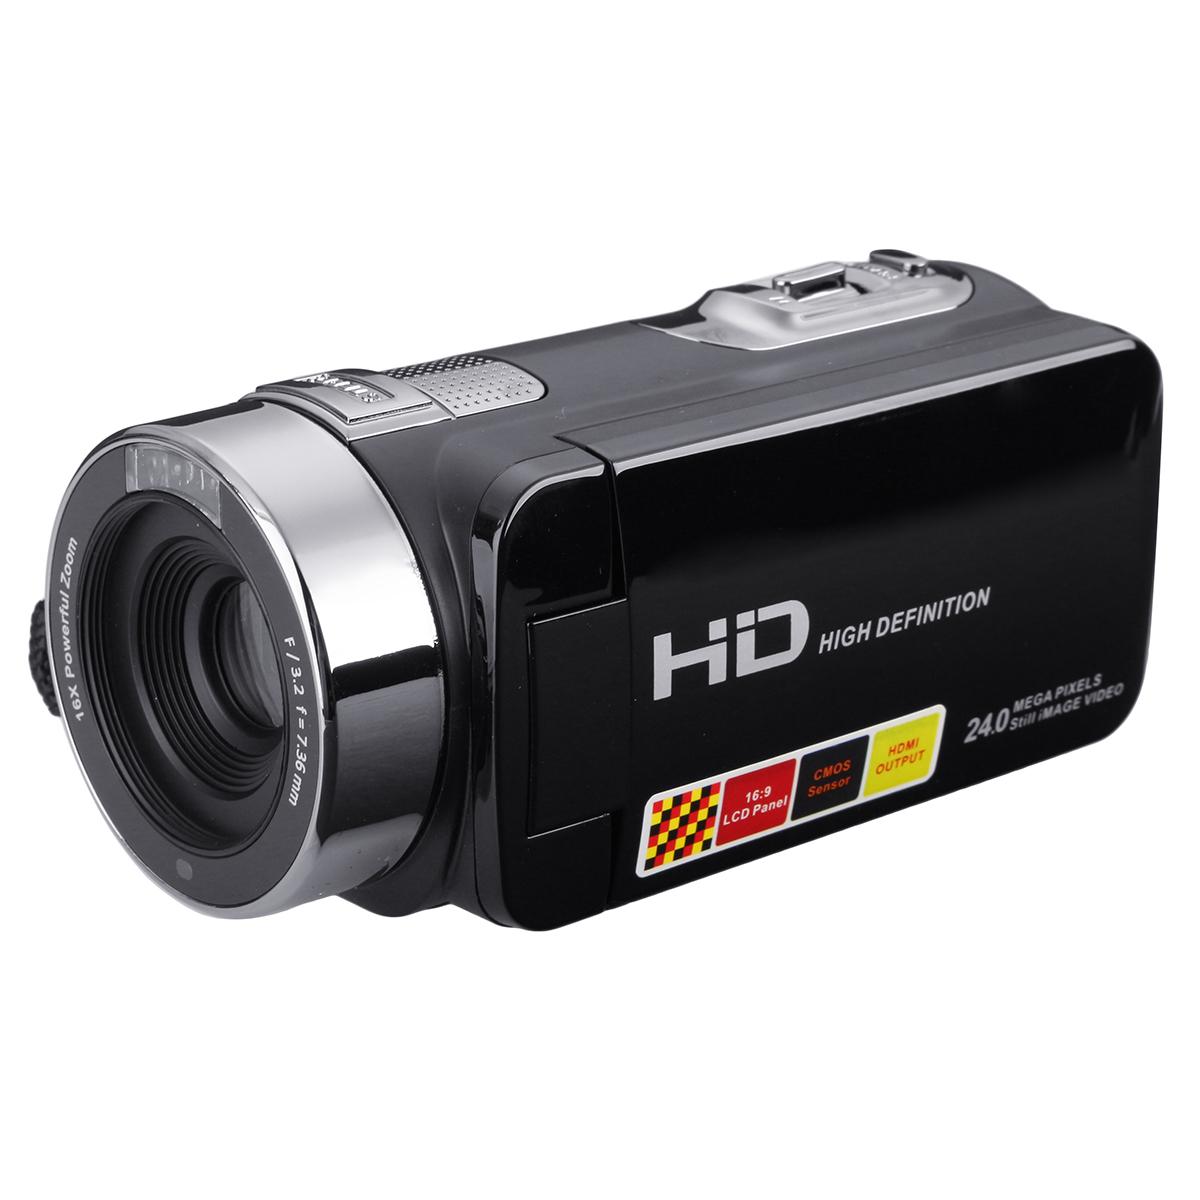 Видеокамера Ночная съемка 24MP Цифровая камера С Дистанционное Управление